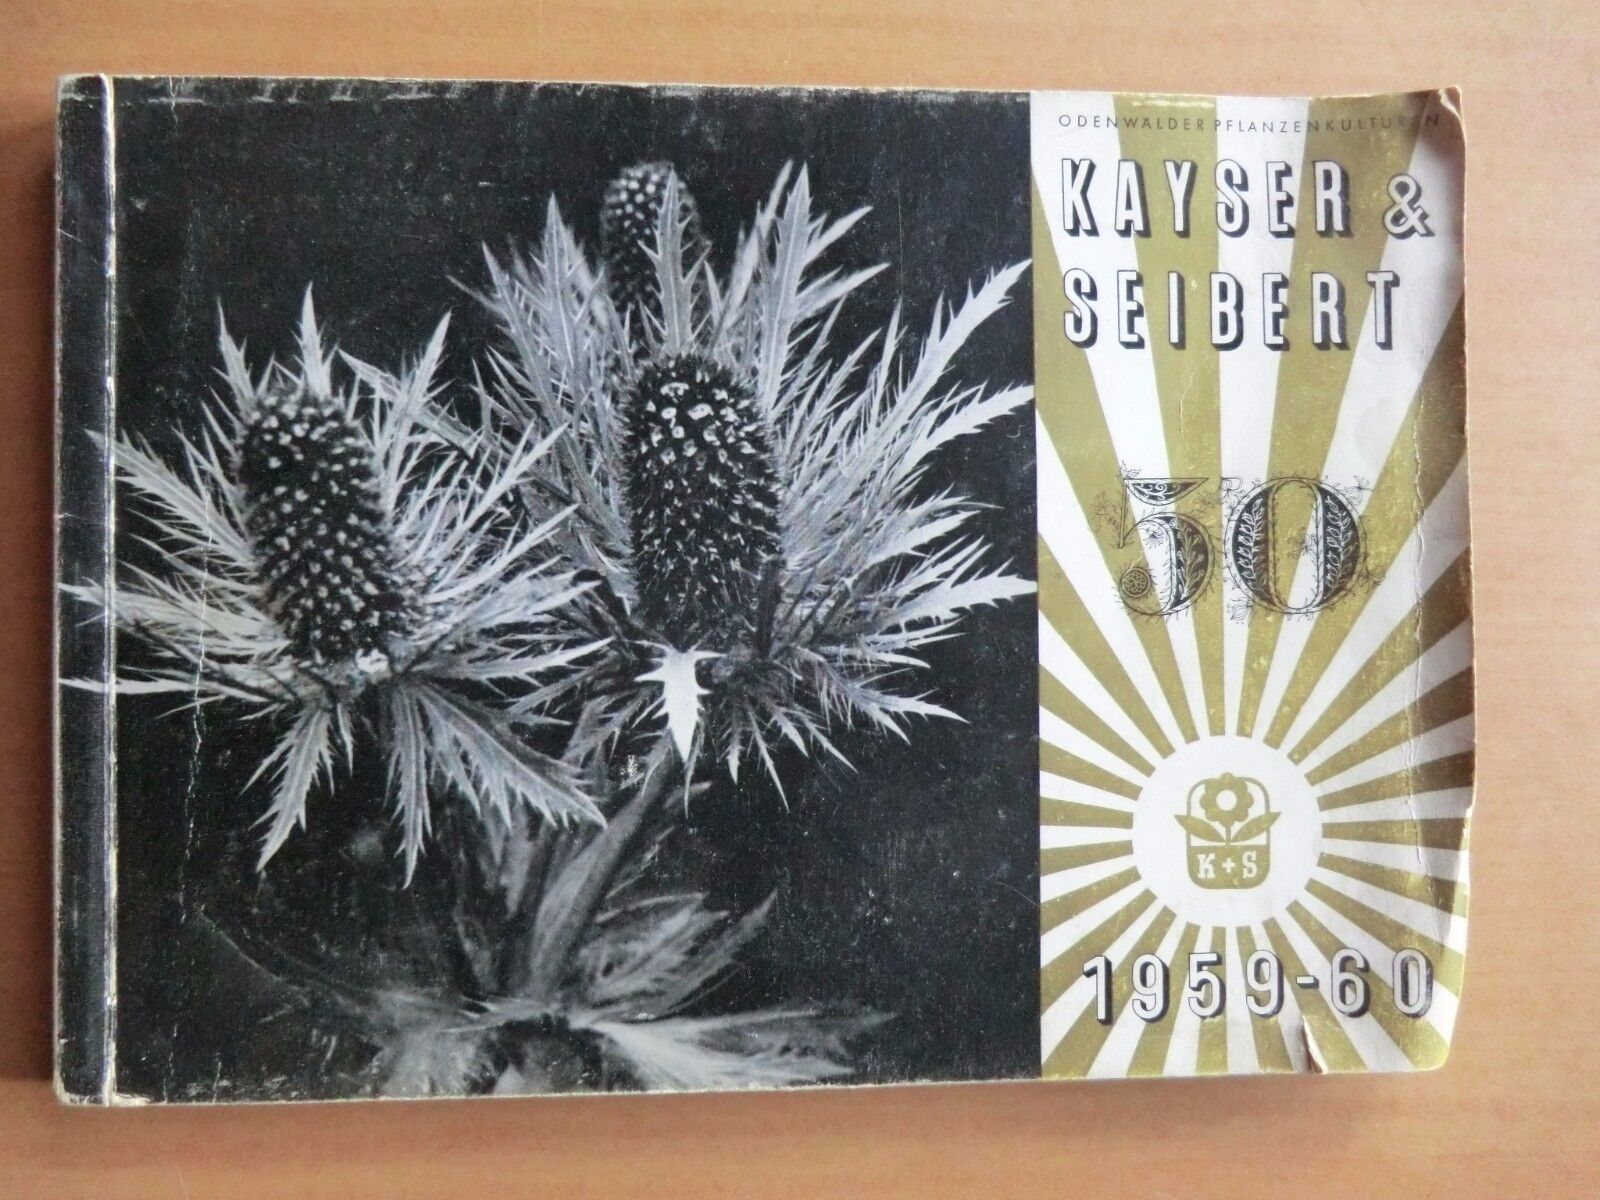 Gartenkatalog Kayser&Seiber 1959/60 Blumen Stauden Kräuter Sorten Beschreibungen